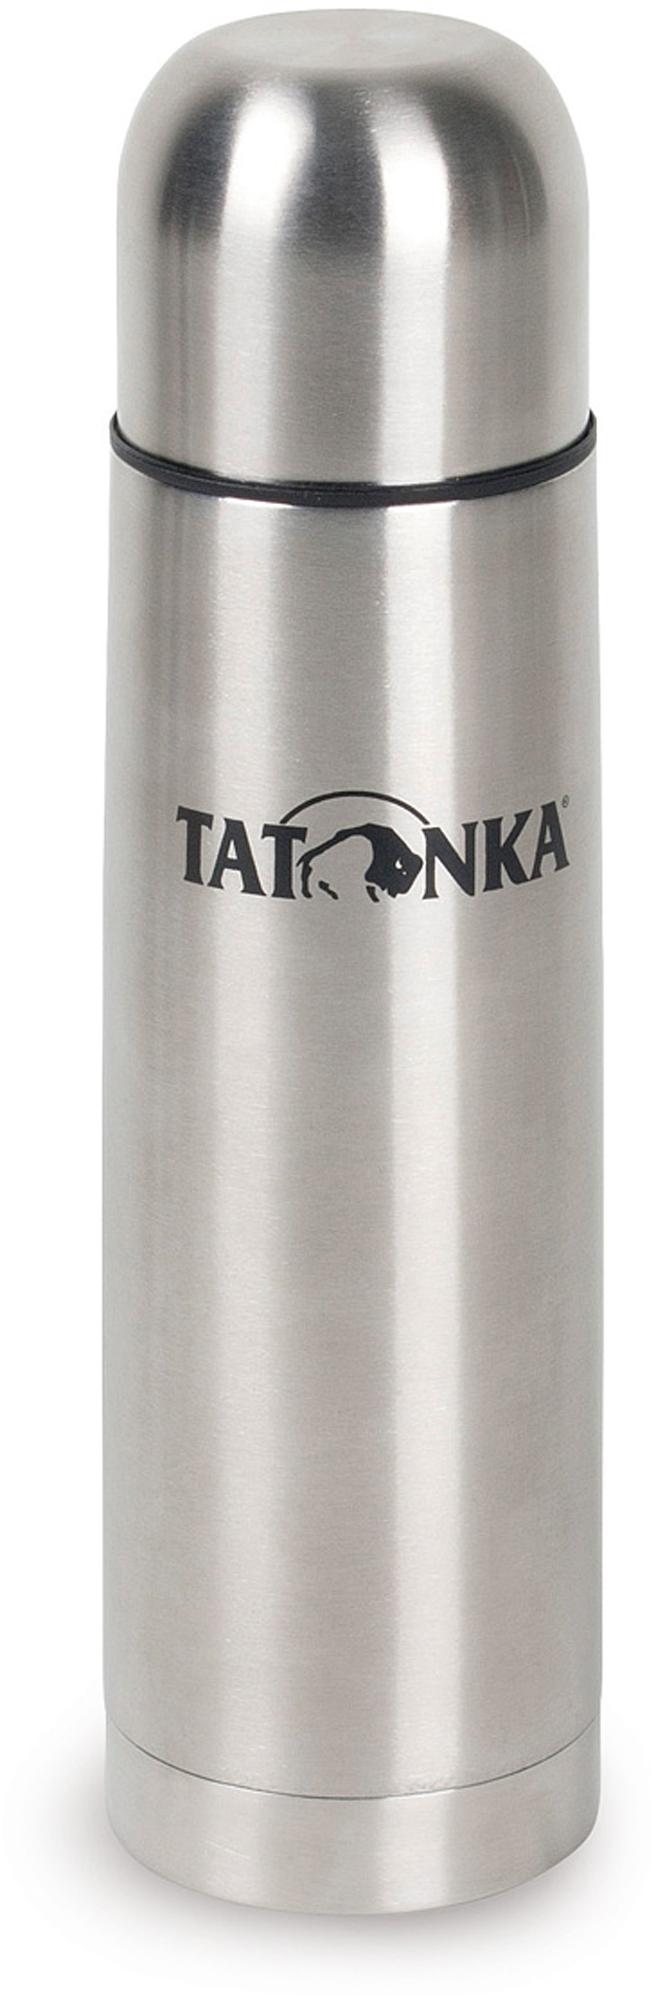 Tatonka Термос Tatonka 0,45 л цена 2017